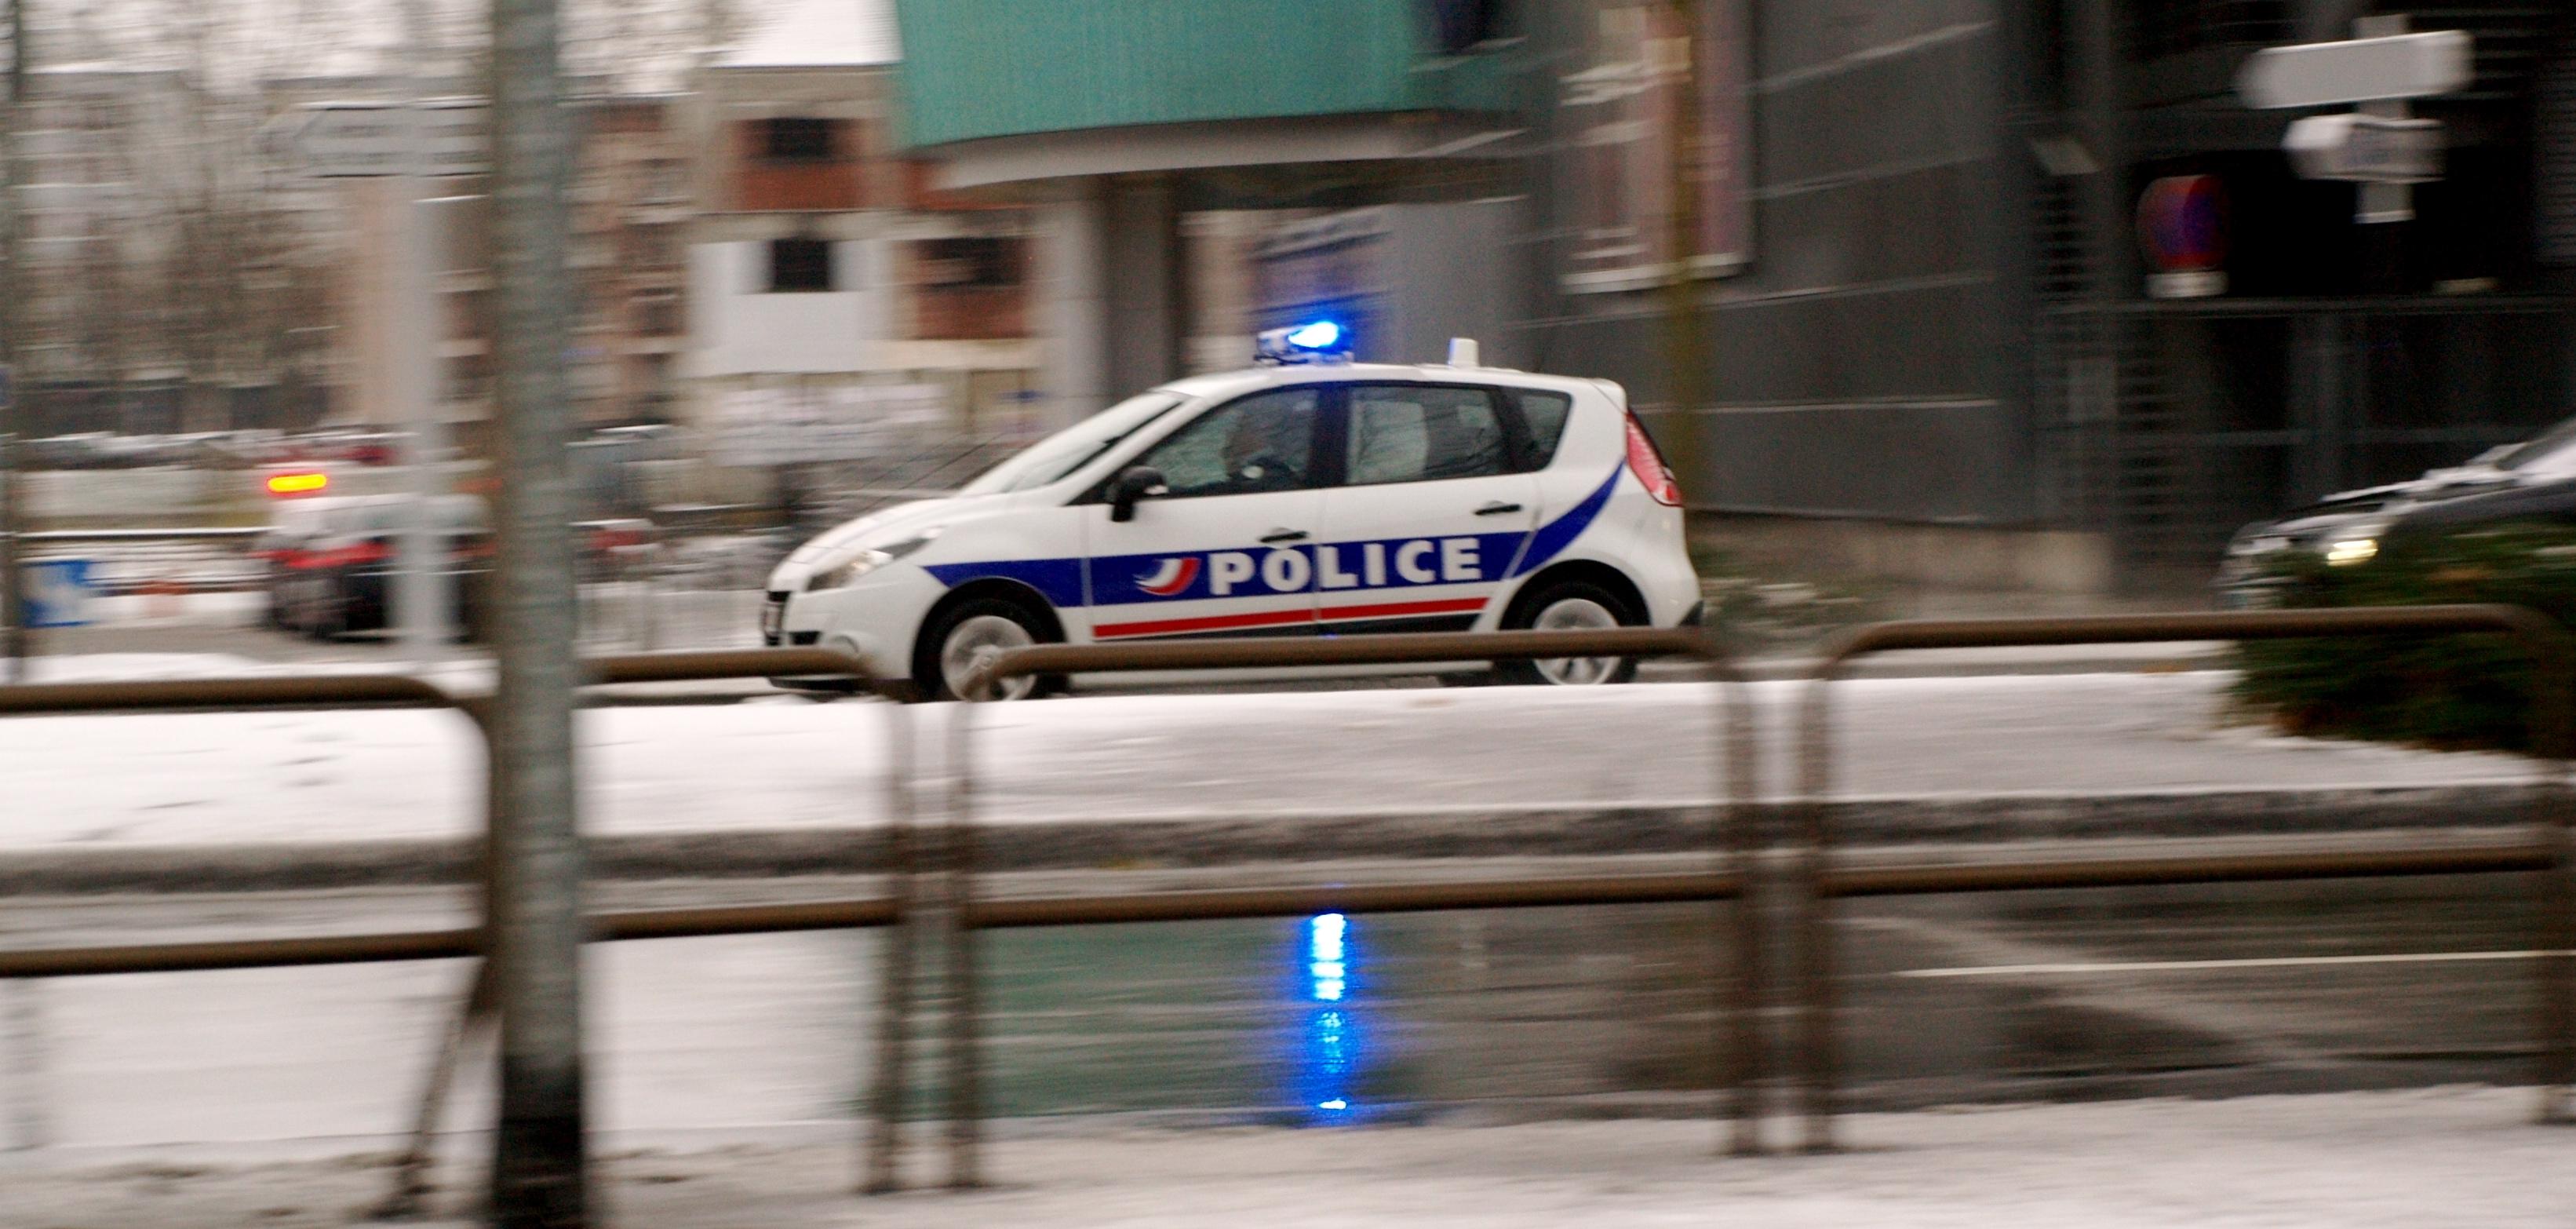 file voiture police nationale en intervention wikimedia commons. Black Bedroom Furniture Sets. Home Design Ideas